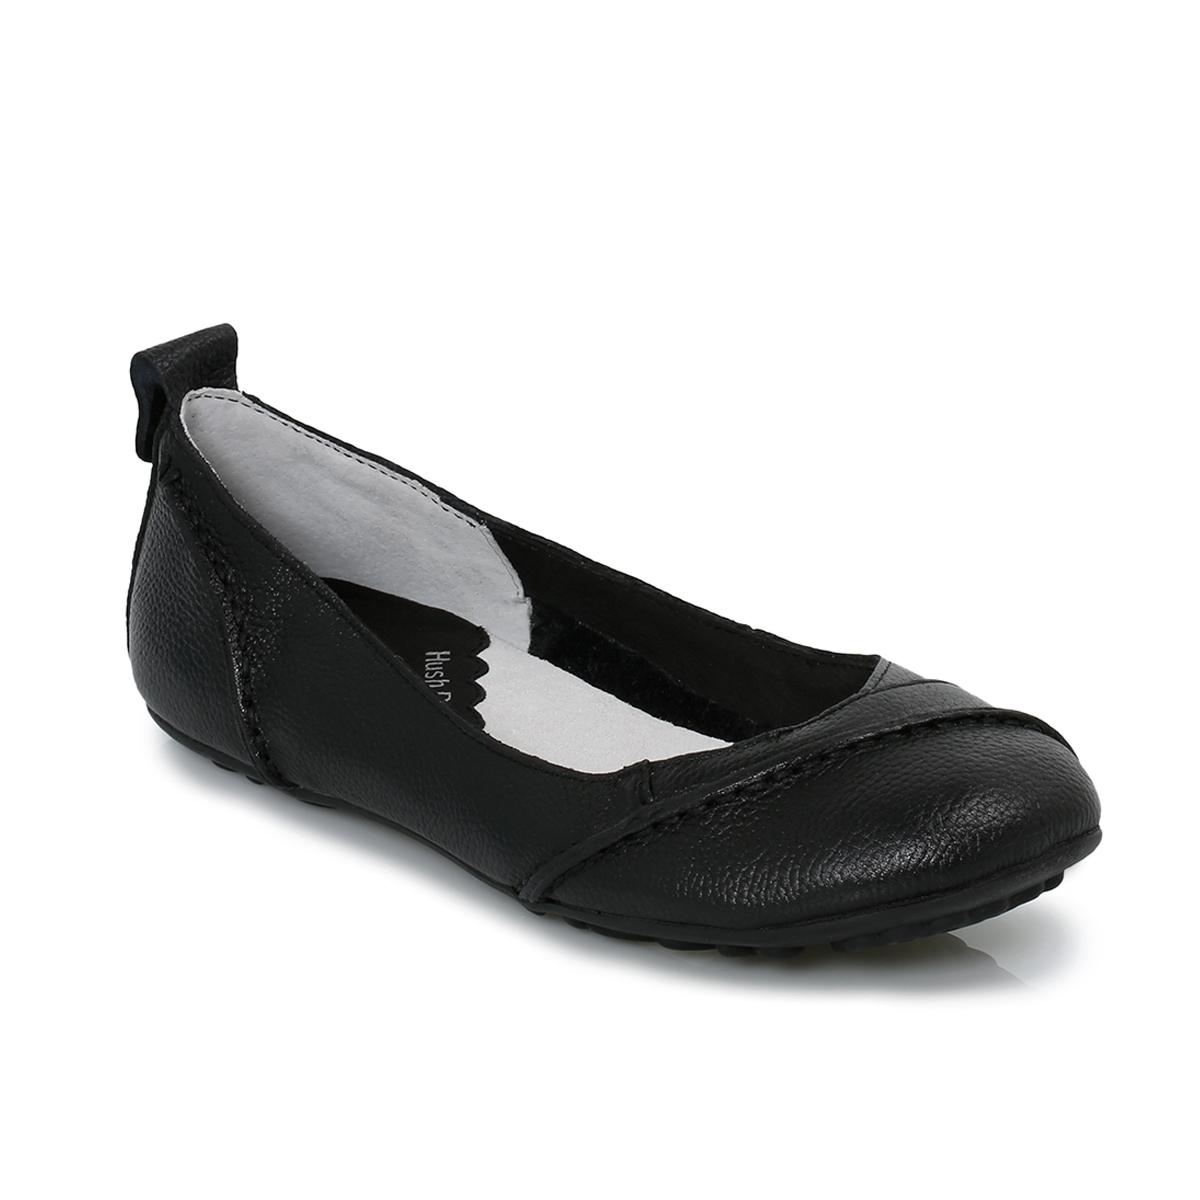 hush puppies janessa black womens flats ballerina shoes